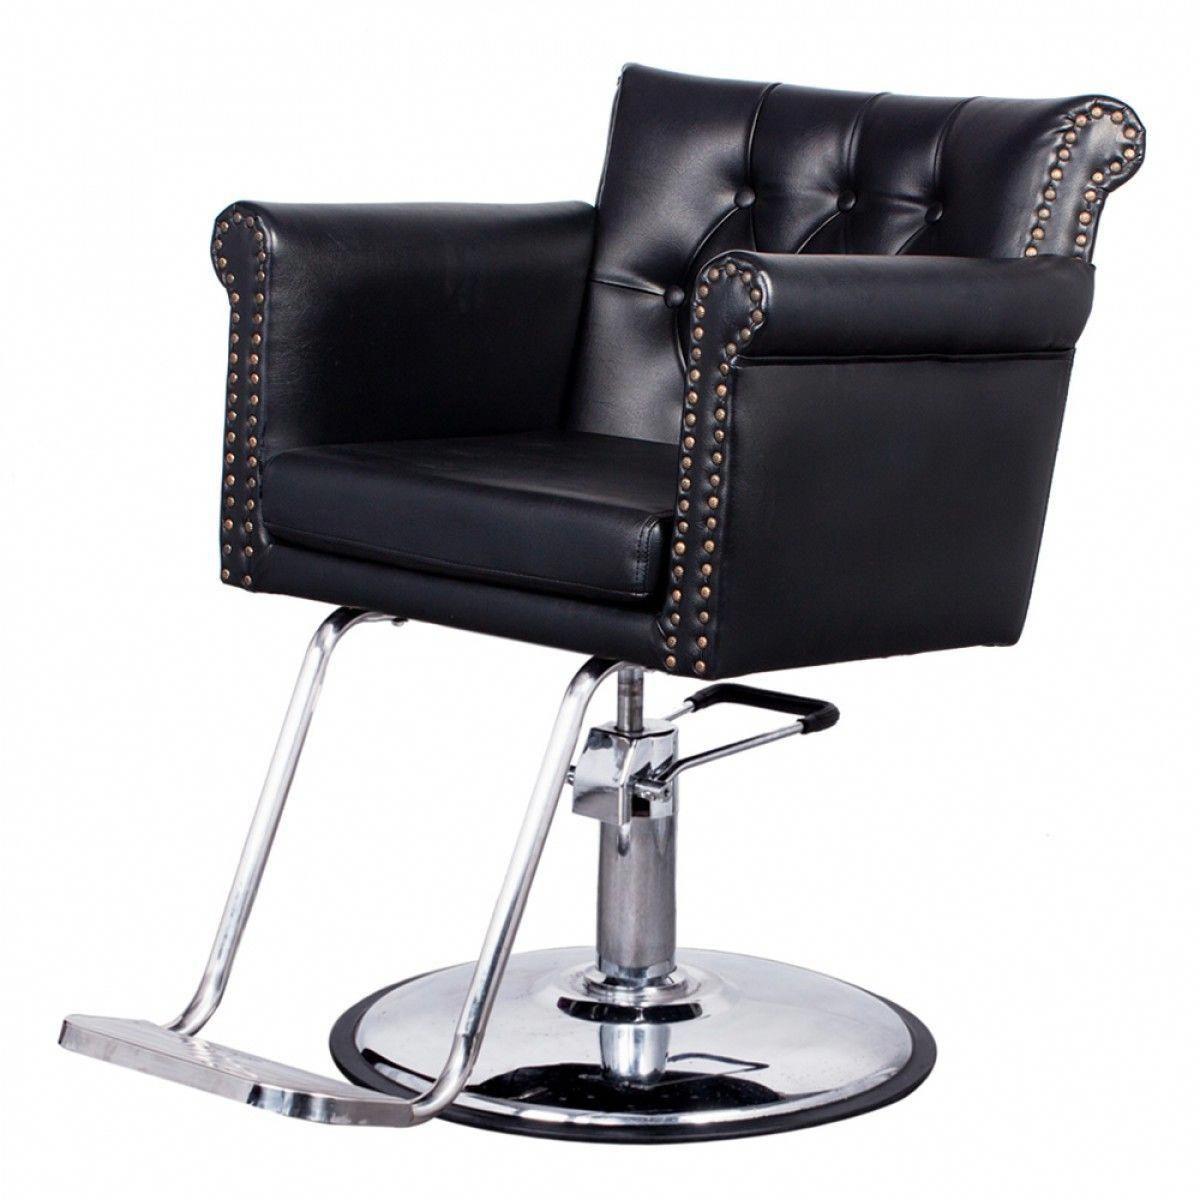 Capri Used Salon Equipment For Sale Wholesale Salon Equipment